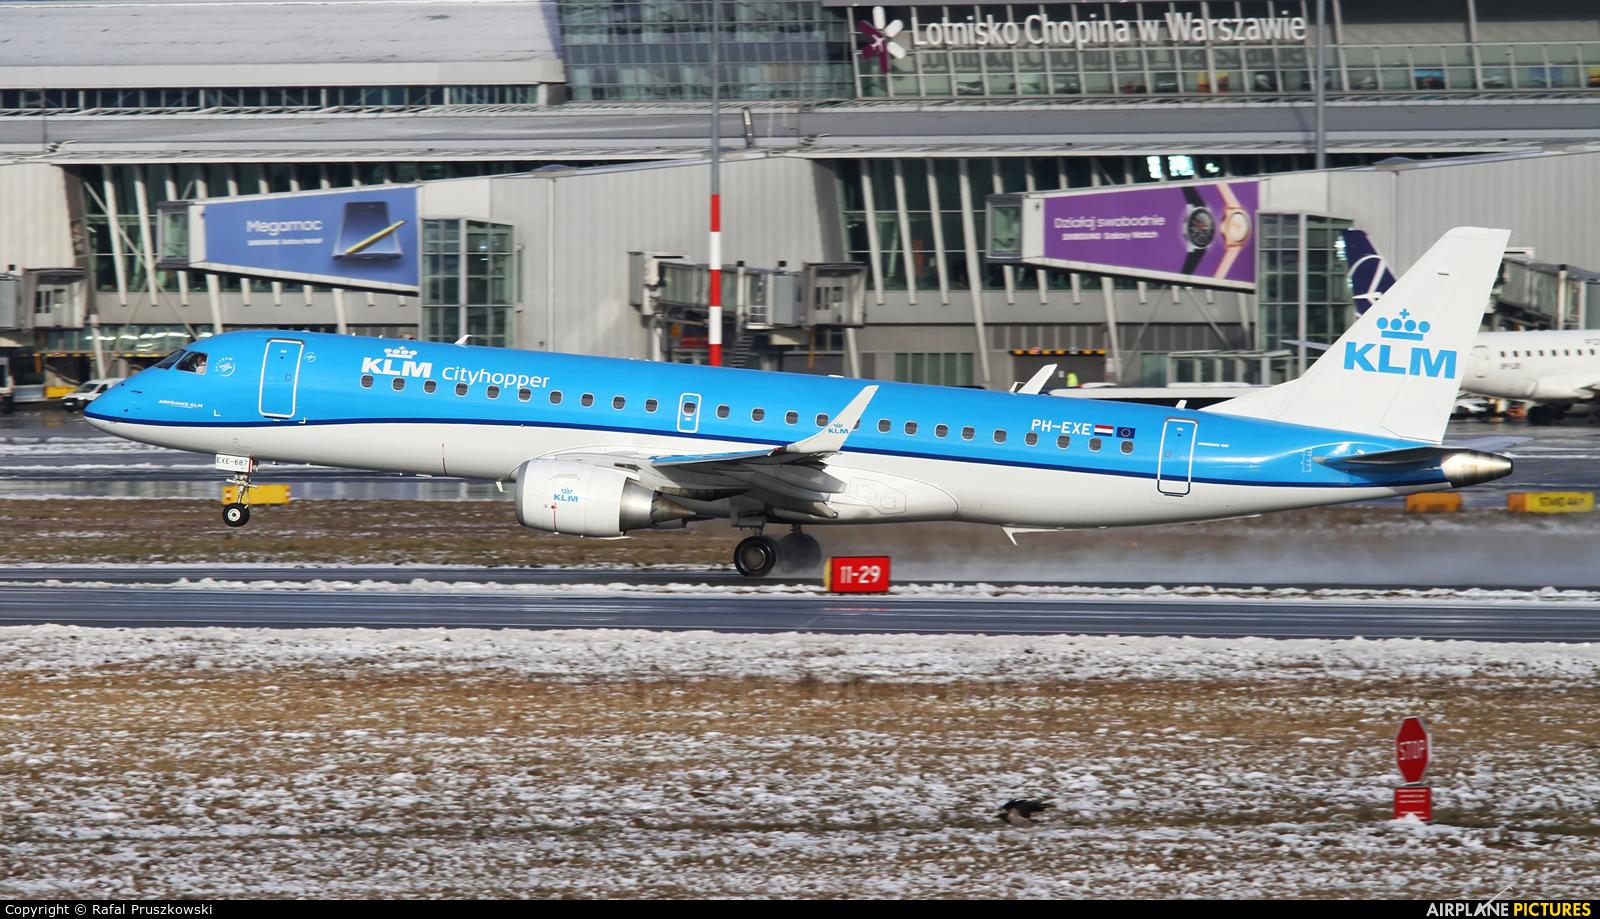 KLM Cityhopper PH-EXE aircraft at Warsaw - Frederic Chopin